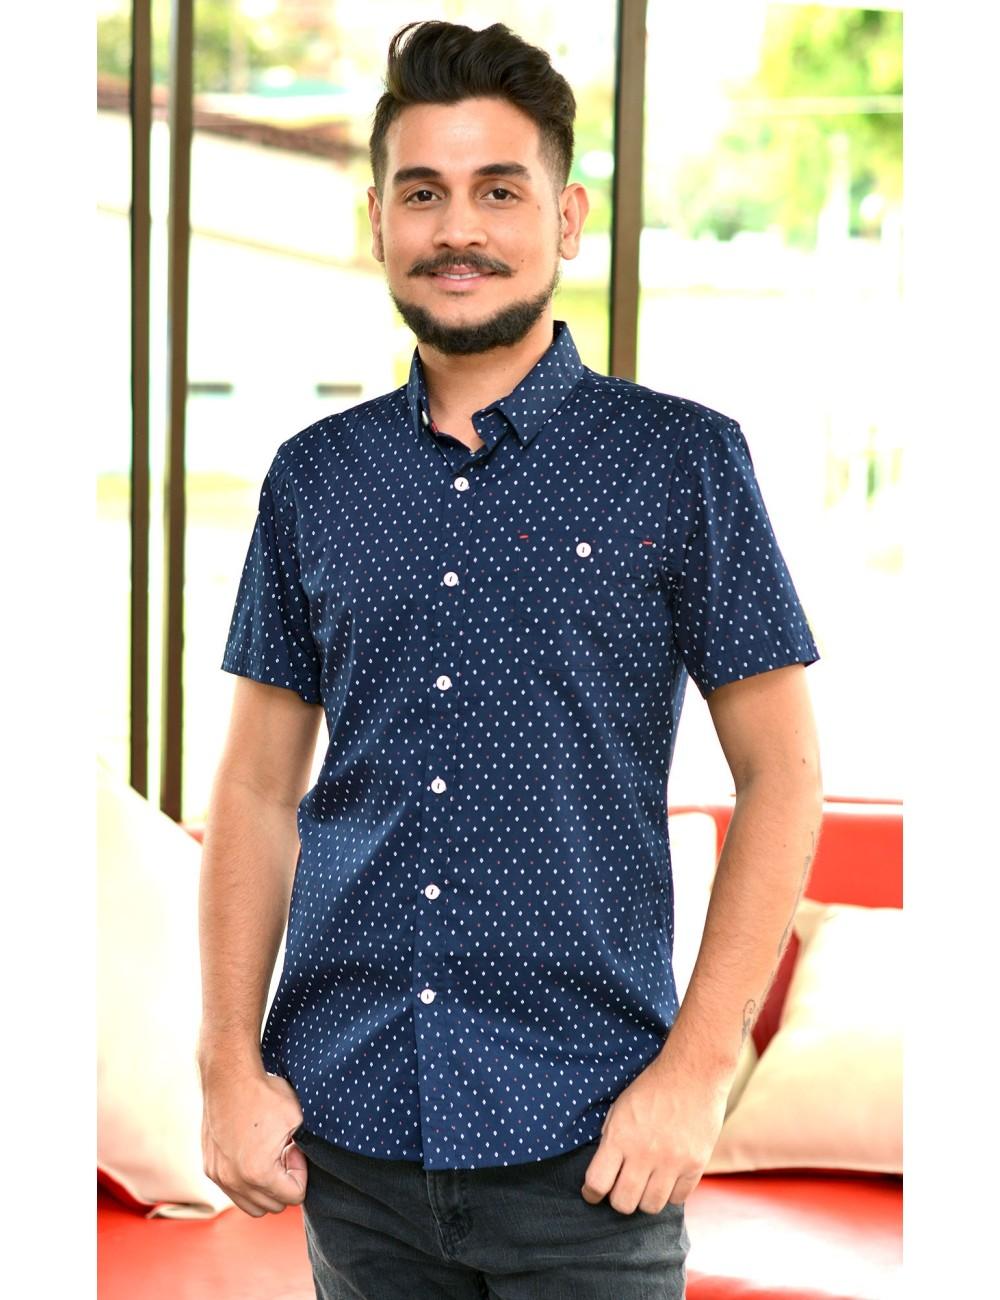 Camisa azul manga corta rombos blancos